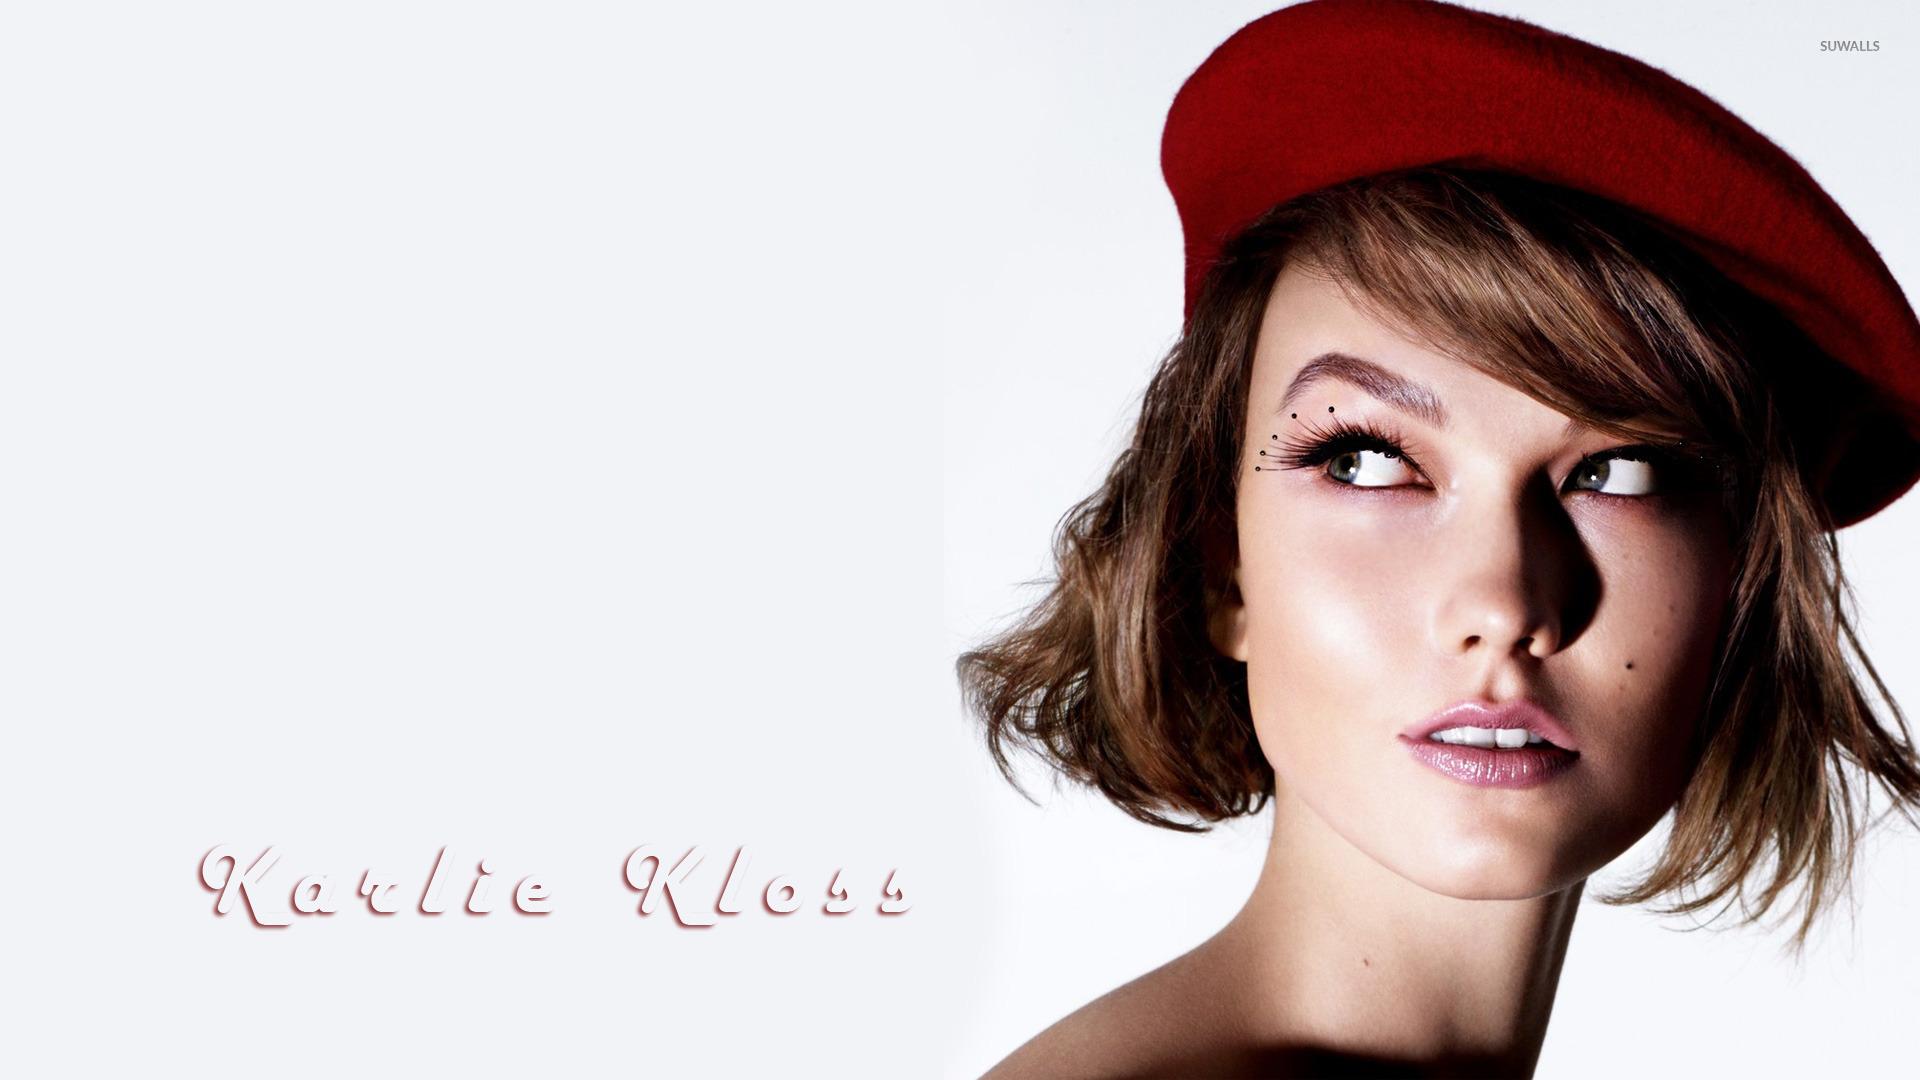 Karlie Kloss Wallpapers